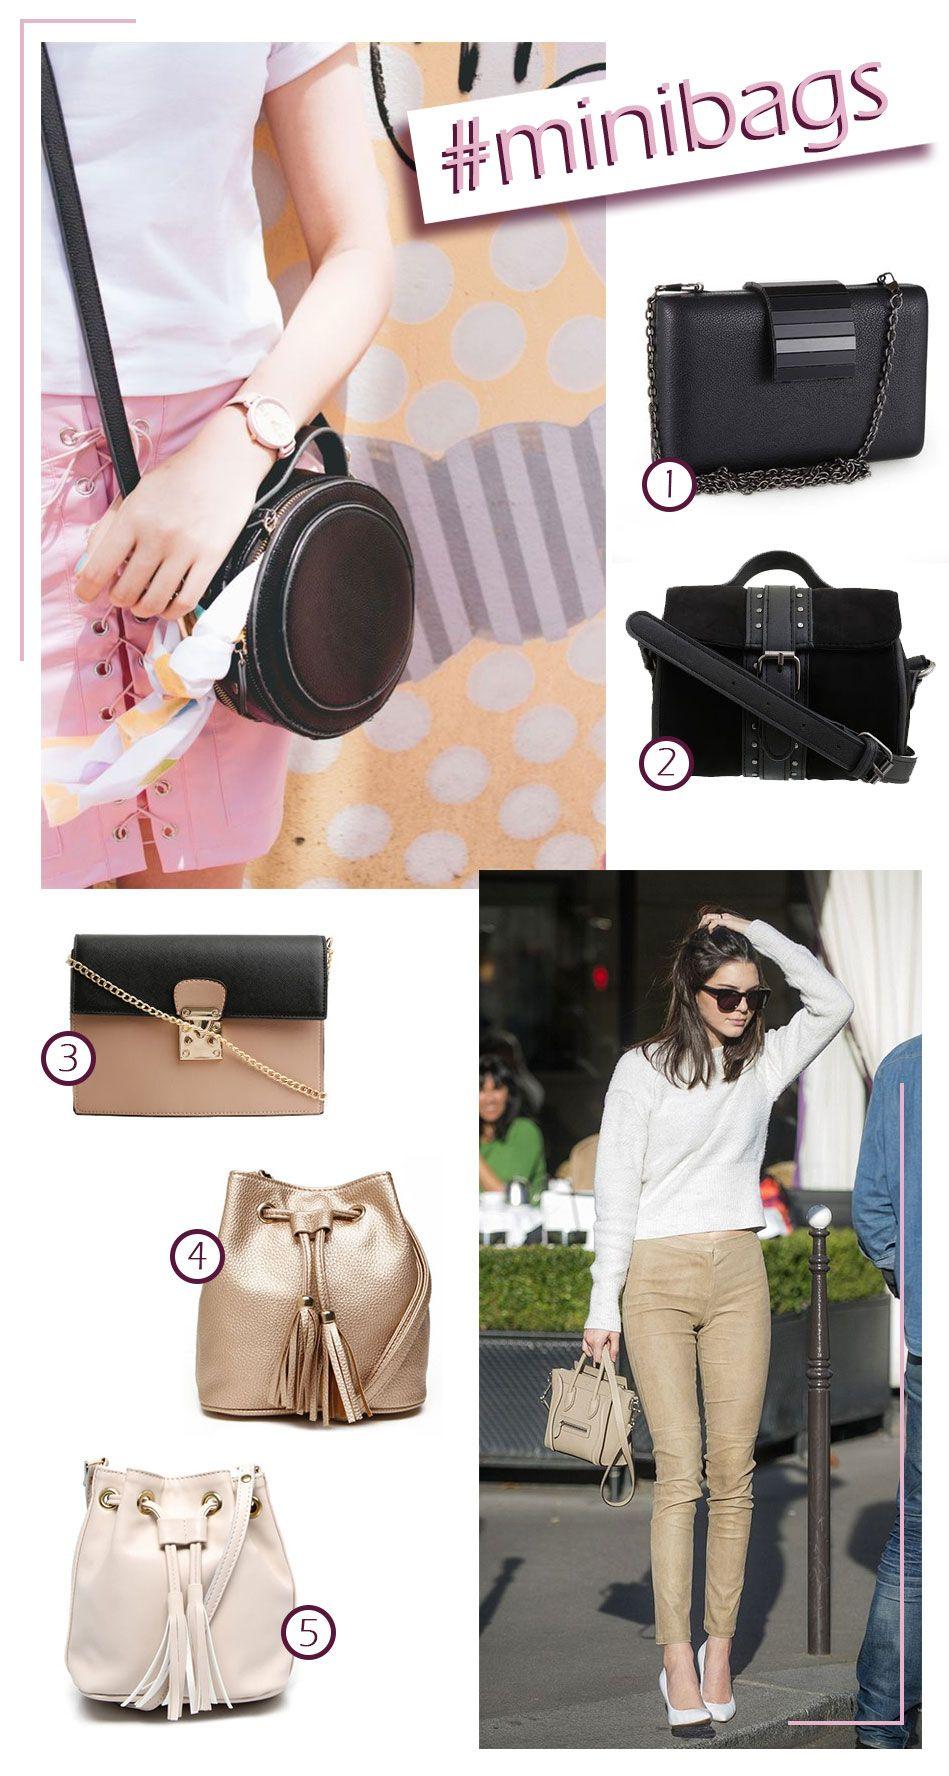 Onde Comprar Mini Bags por Preço Baixo #minibags #fashion #look #bag #moda #bags #bolsas #blog